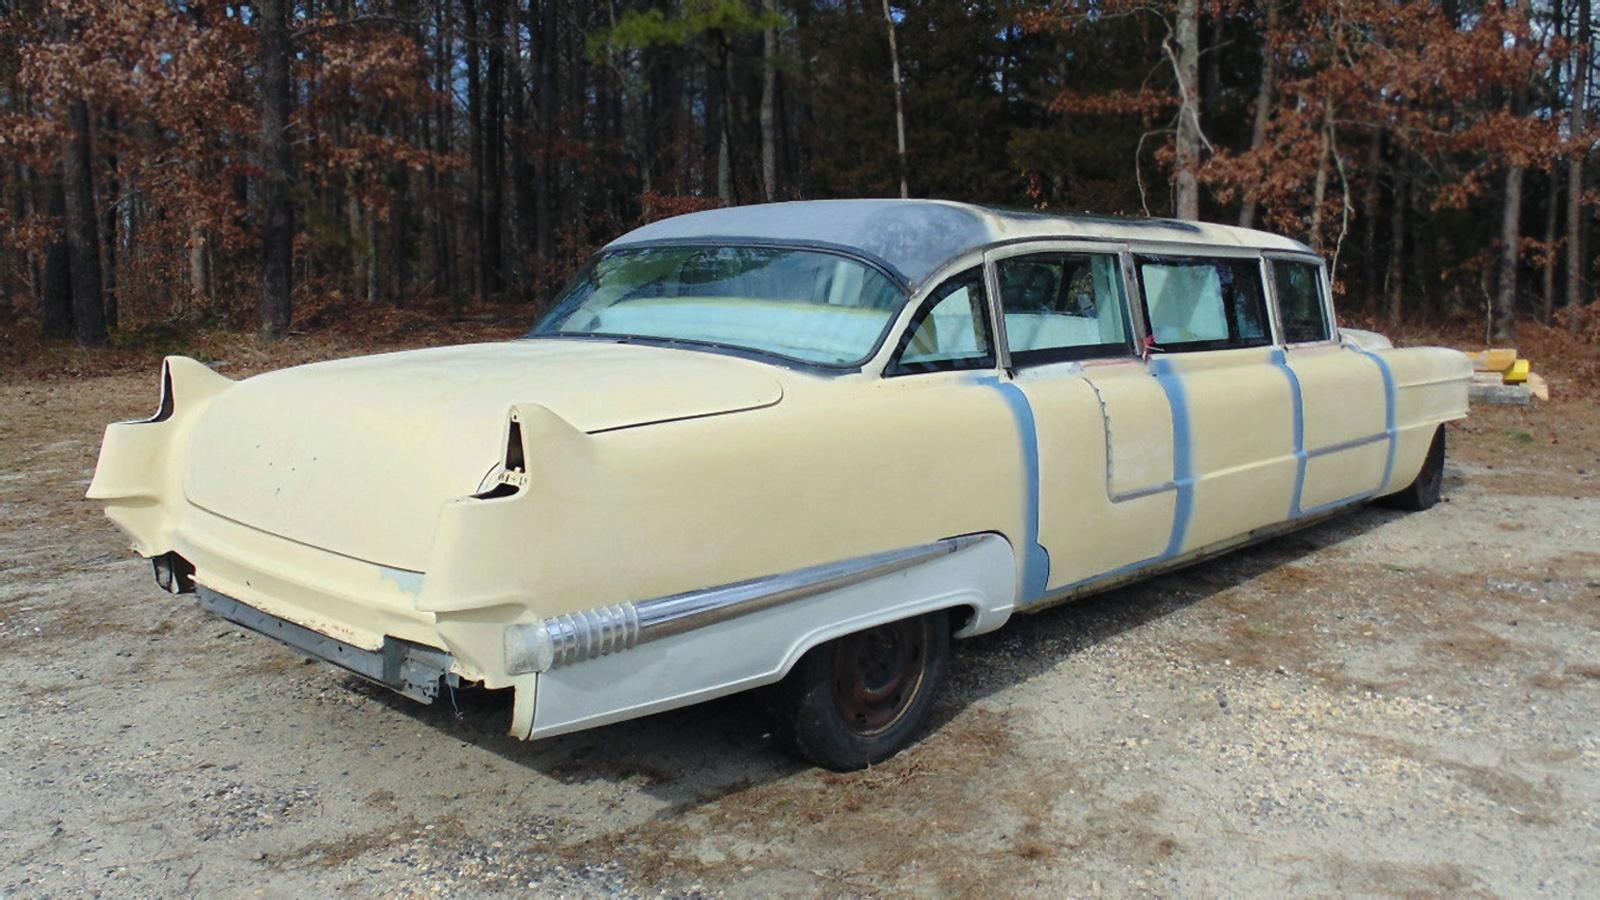 Fordillac 1956 Cadillac Fleetwood 60 Special